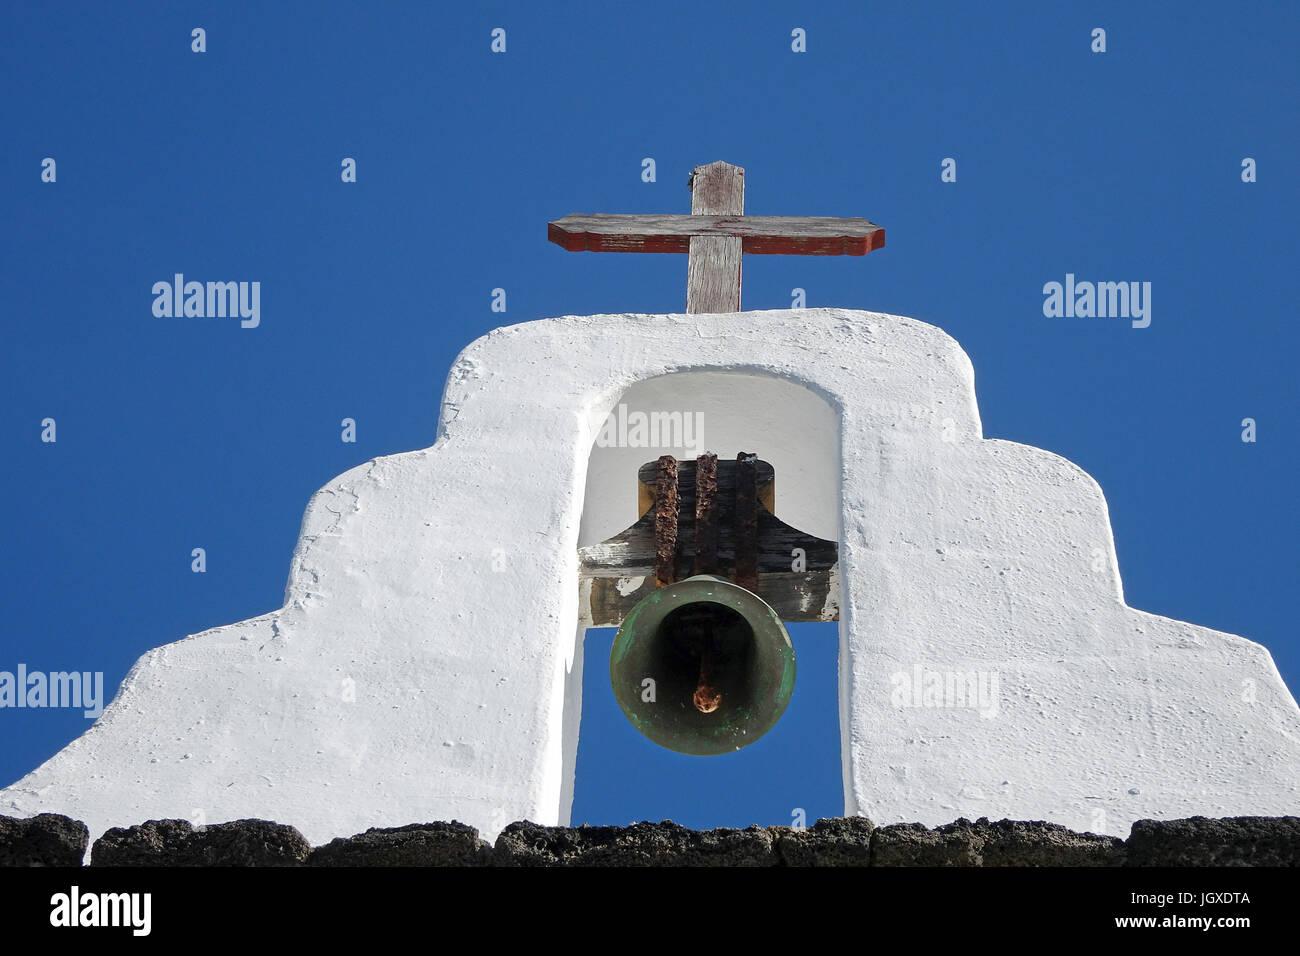 Glockenstuhl der Kirche Iglesia de San Roque in Tinajo, Lanzarote, Kanarische Inseln, Europa | Bell of church Iglesia - Stock Image